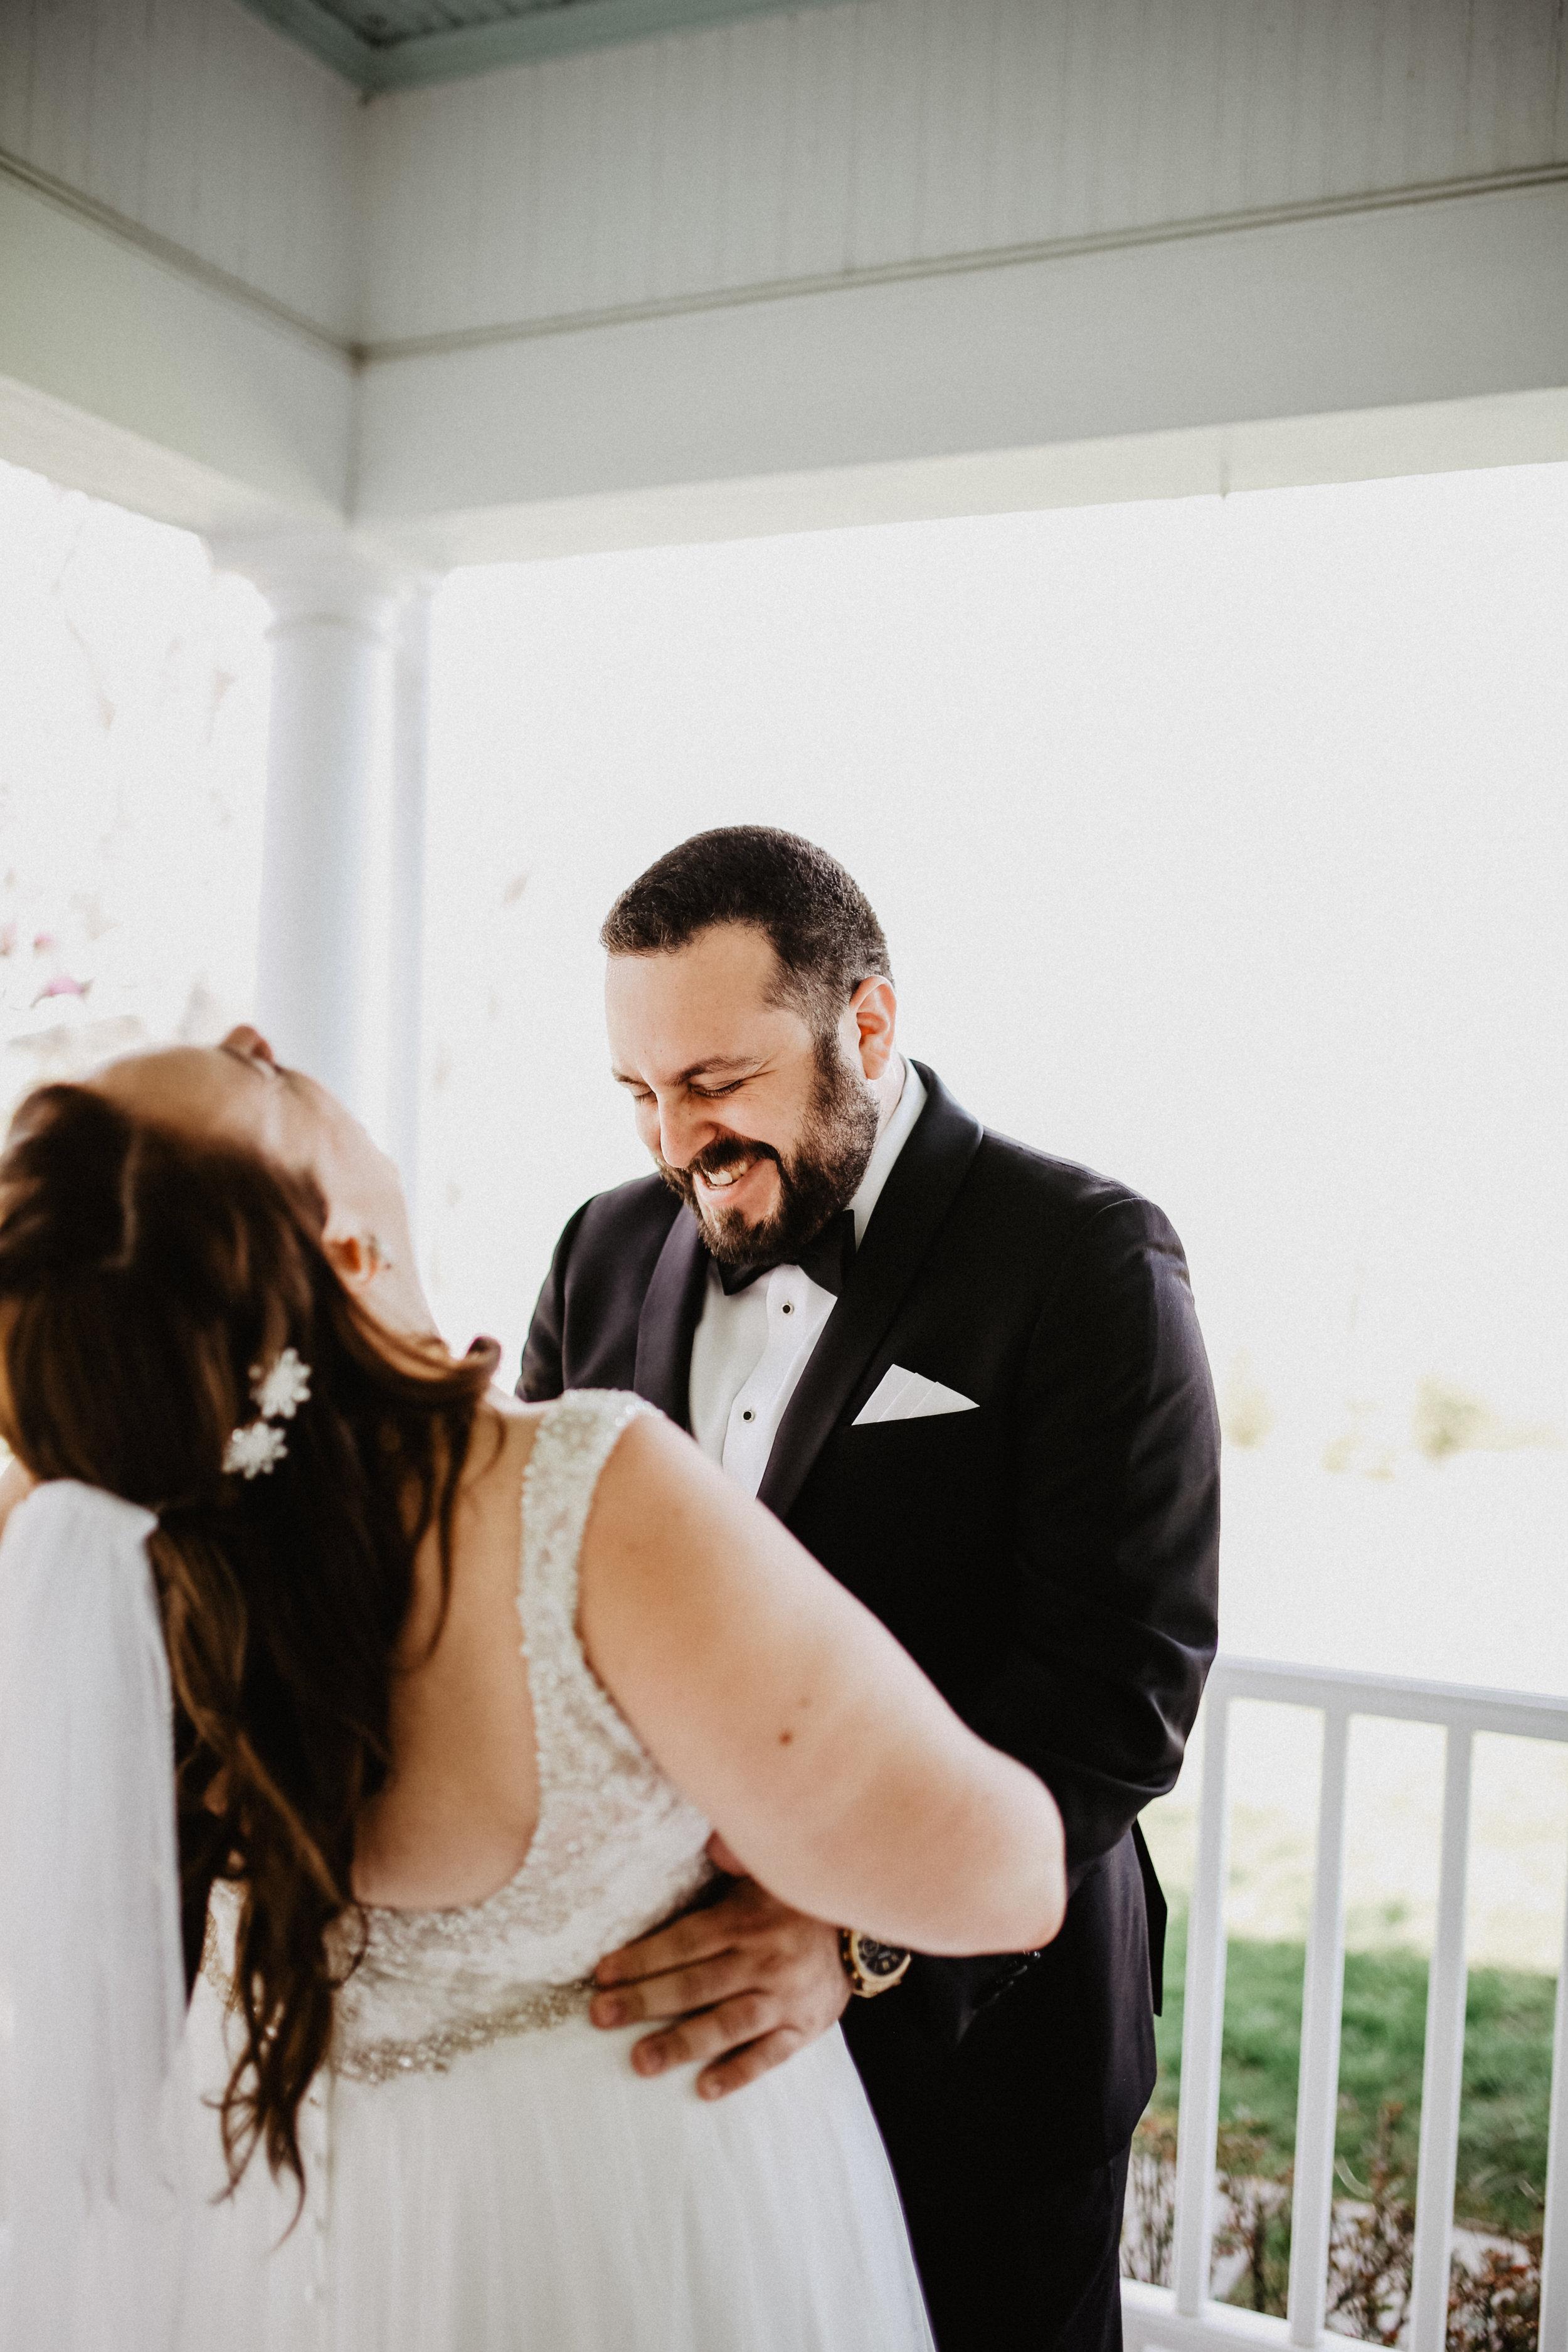 AnthonyKyndra_Married_2018-65.jpg